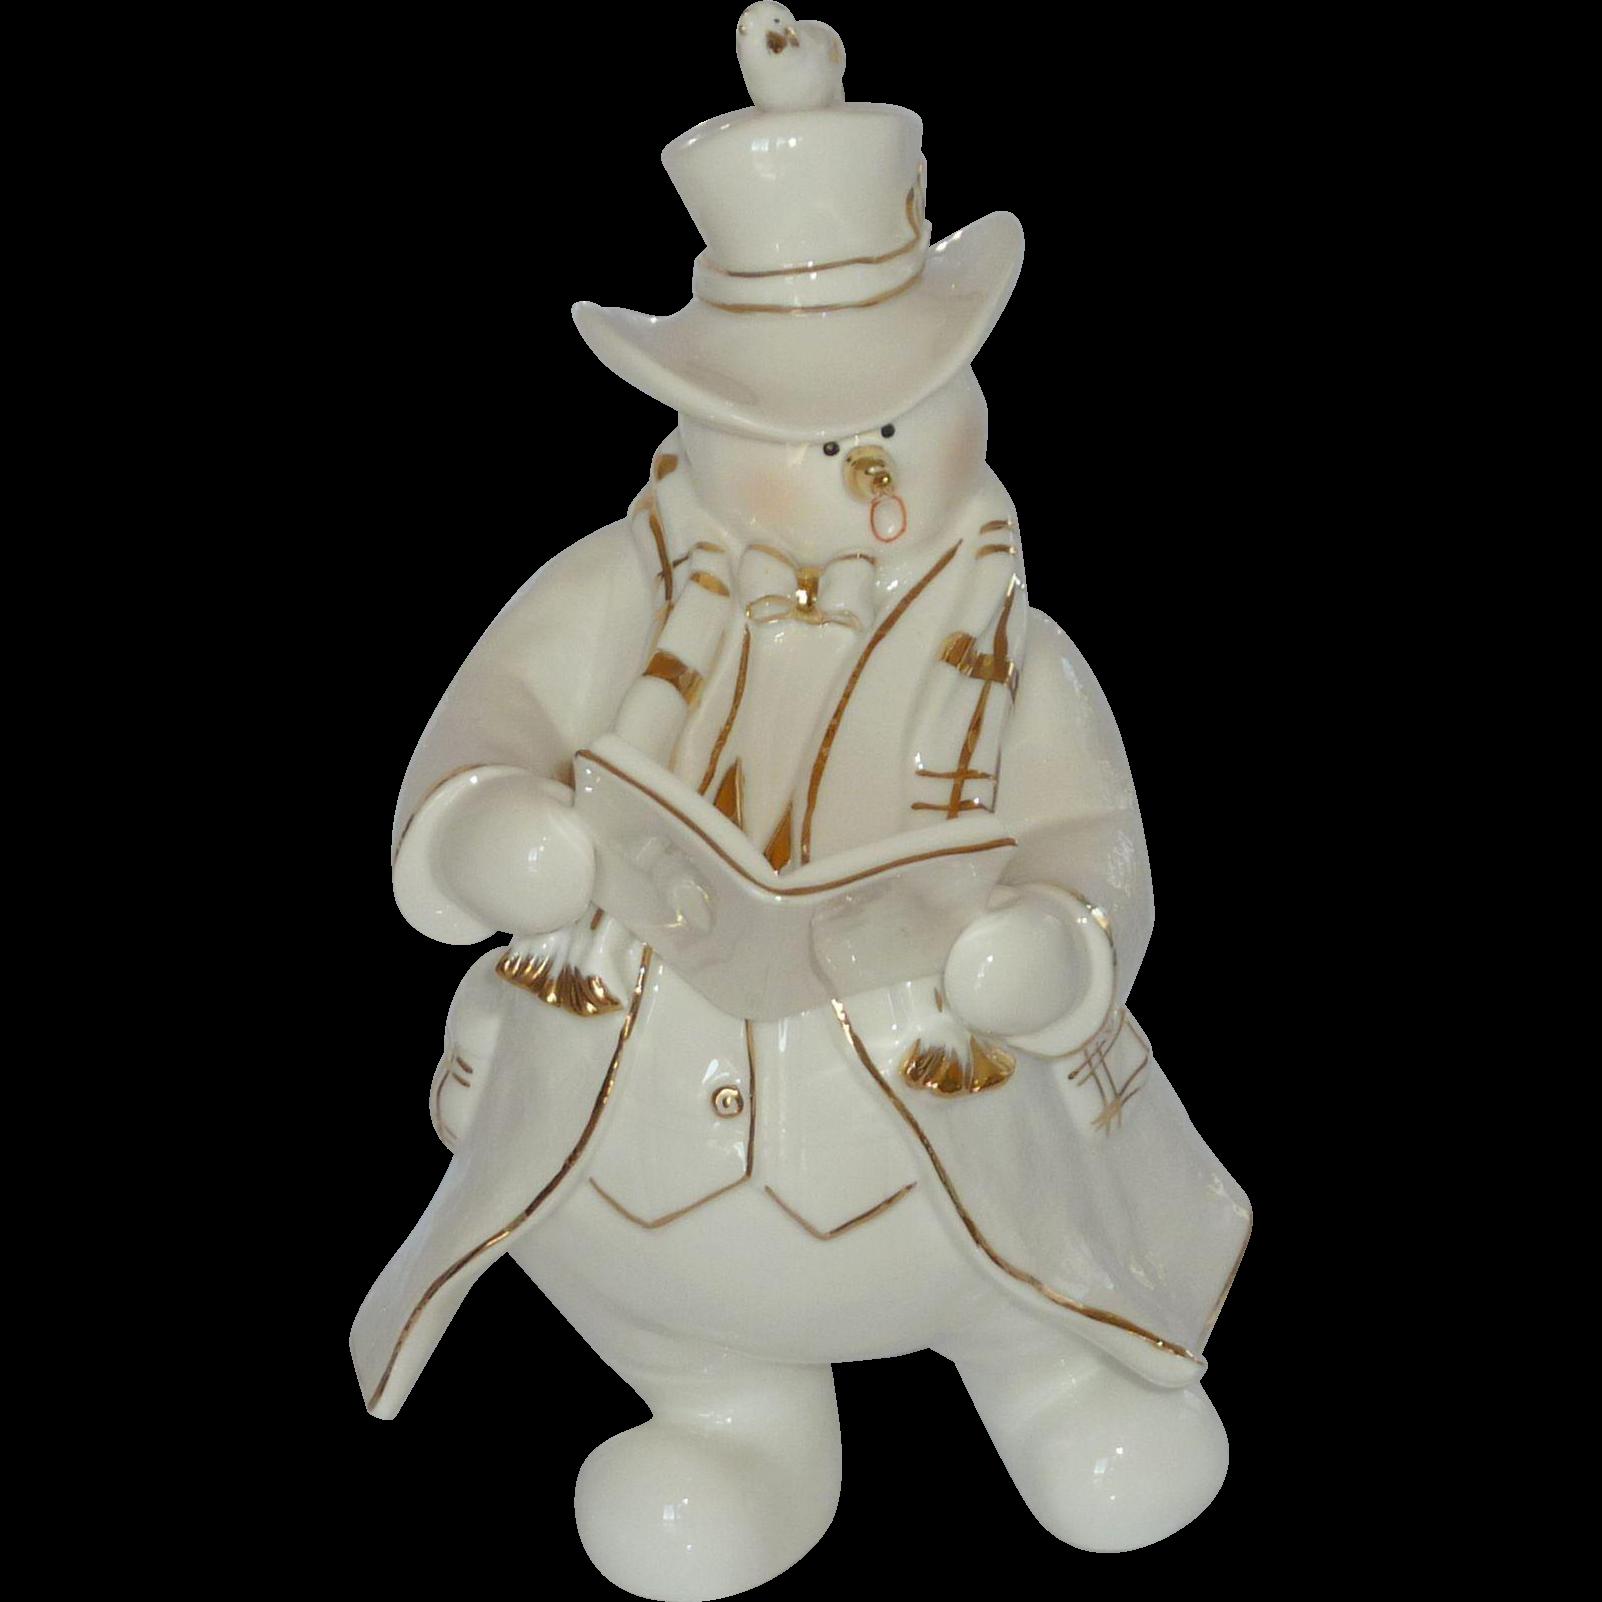 Christmas Caroling Snowman Figurine